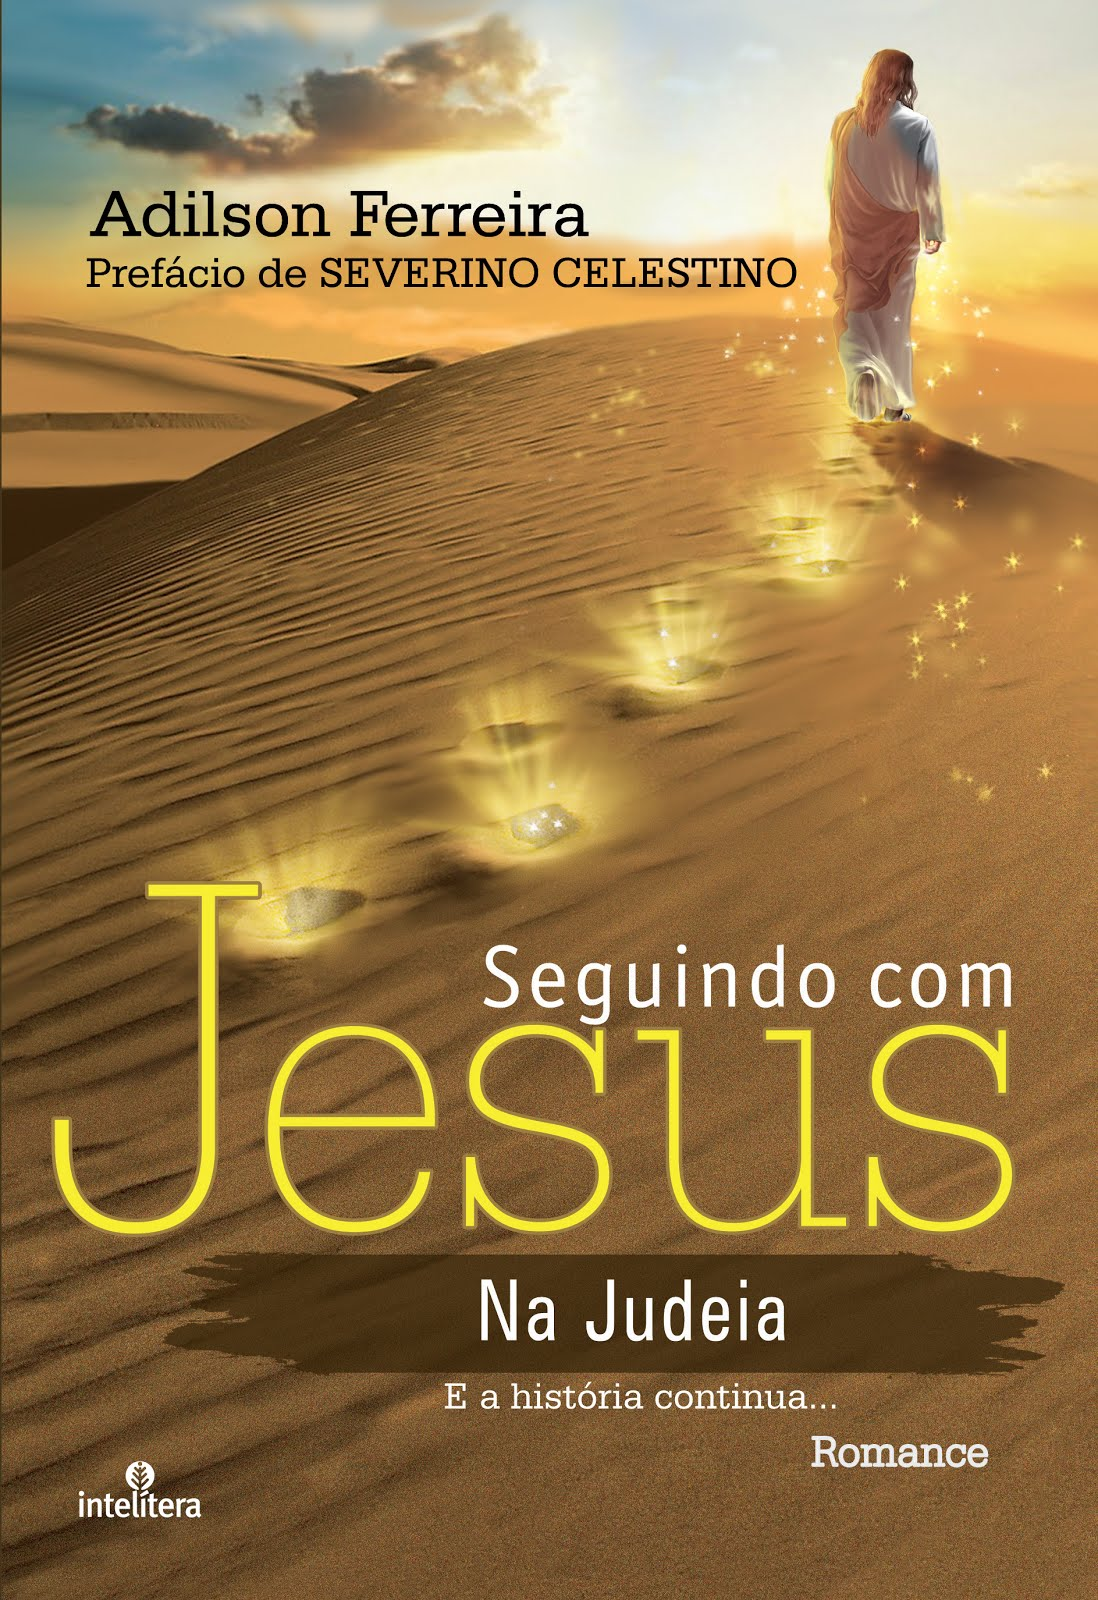 Seguindo com Jesus na Judeia